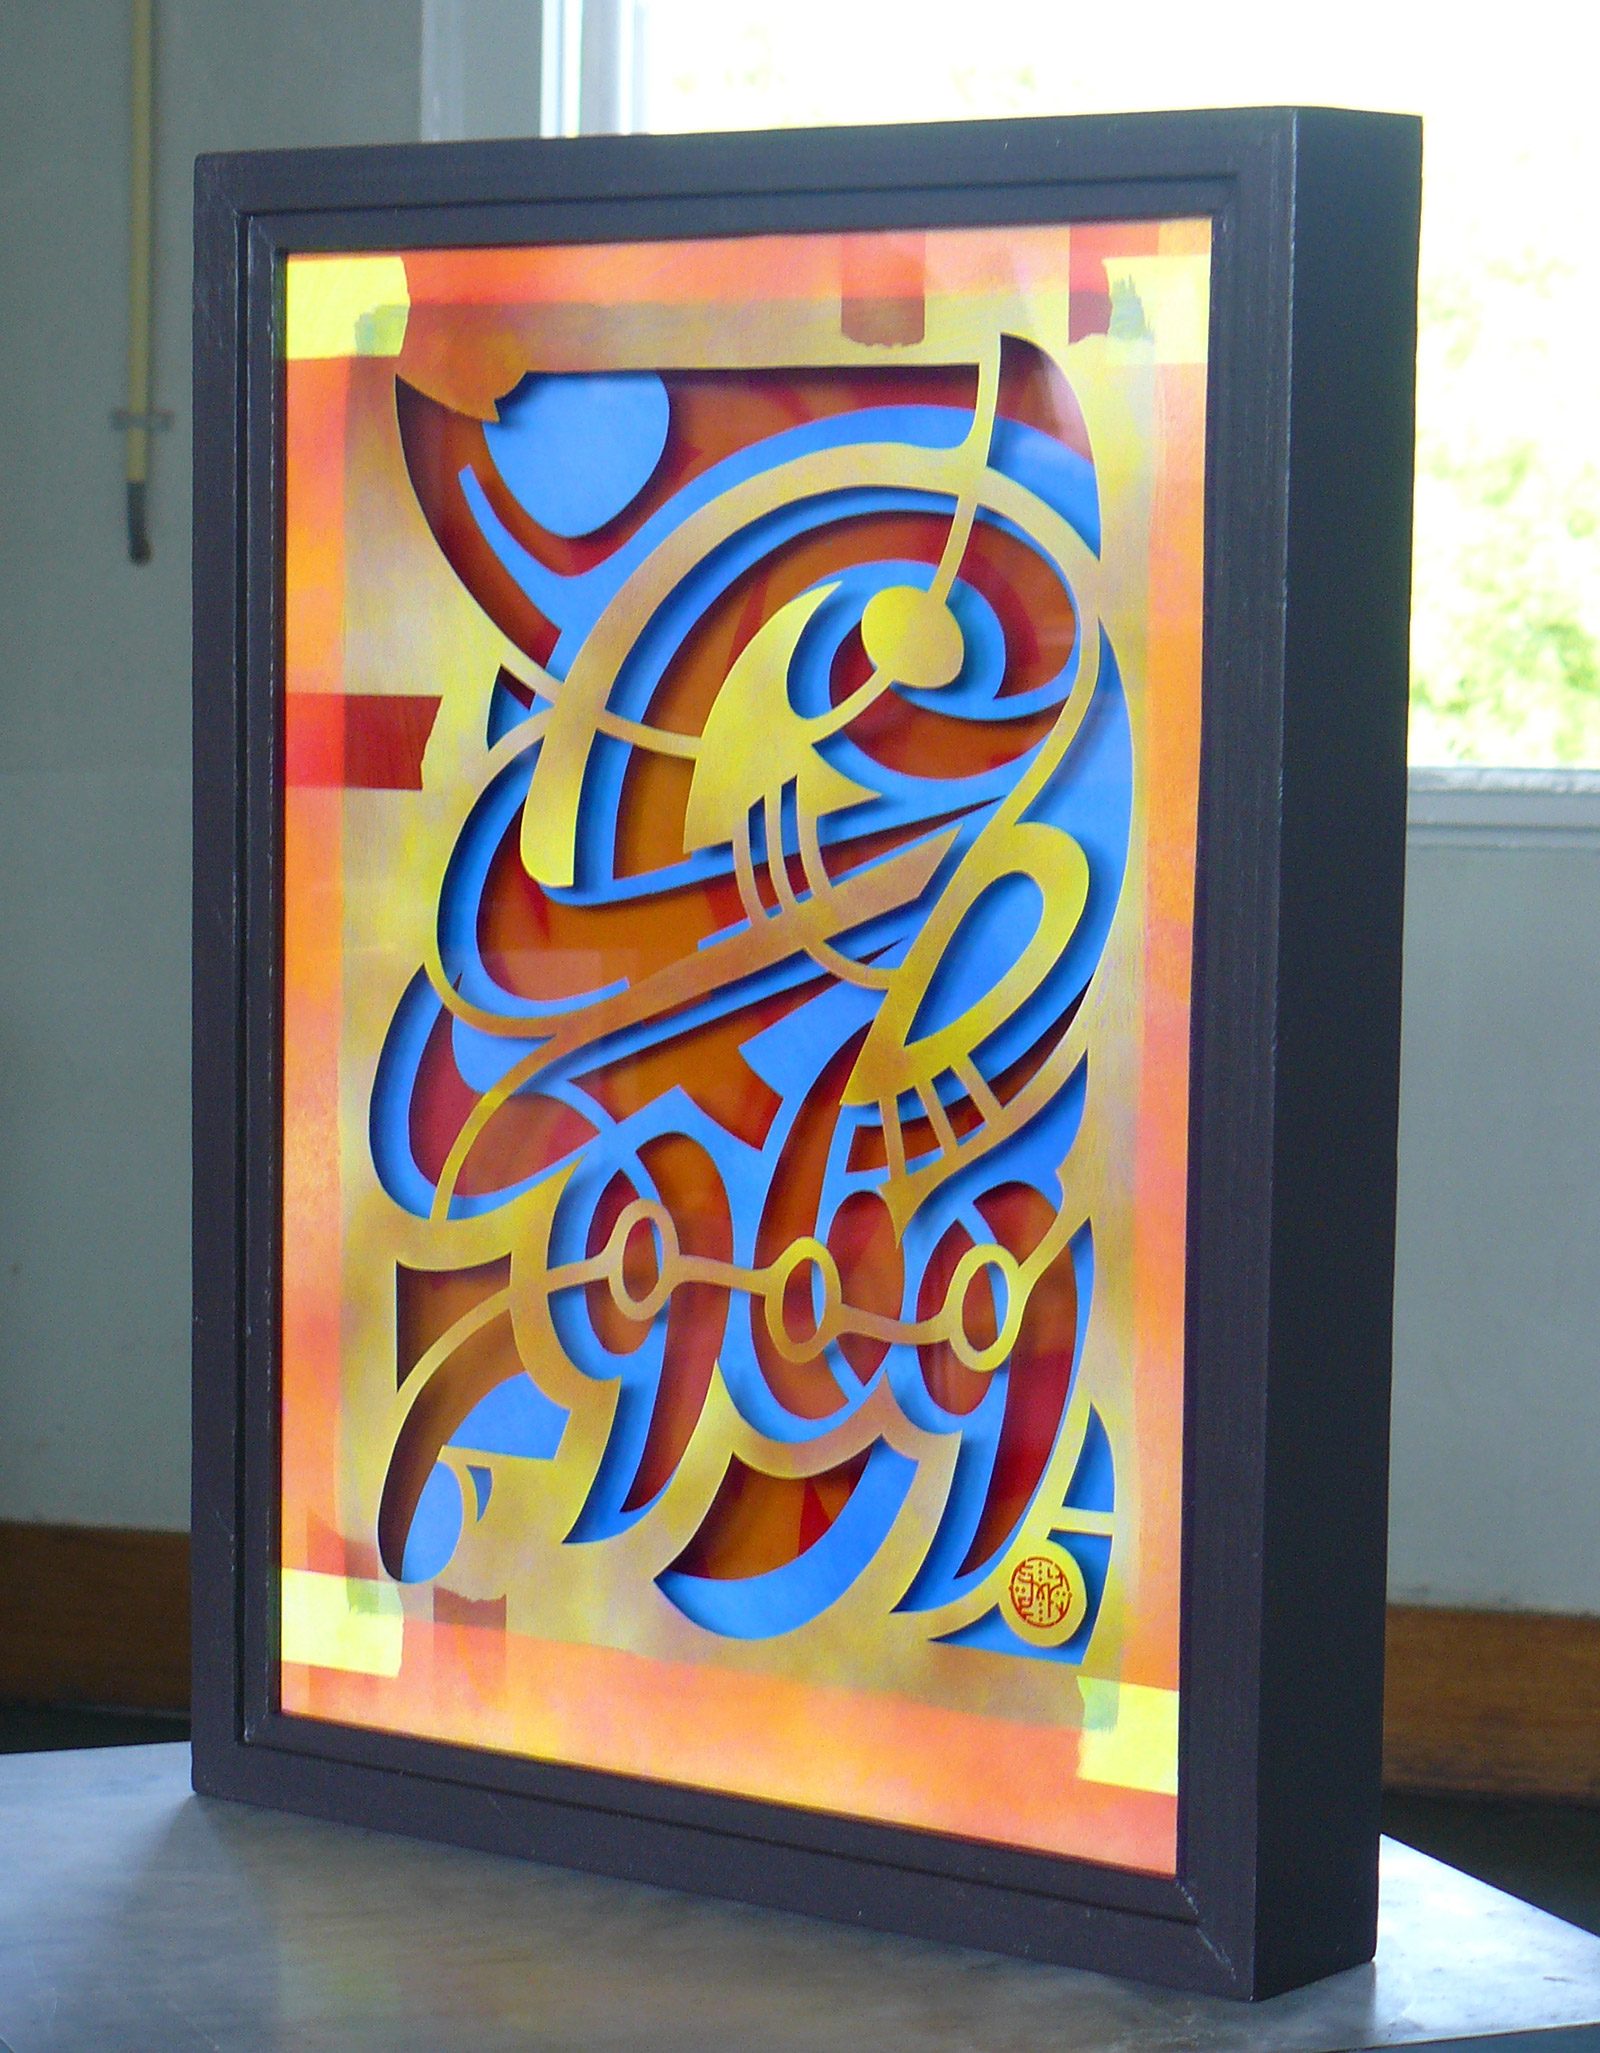 Valutagrafie, Euro Art, Monetizing Art, Art about money, price tags, Haarlem, aerosol art